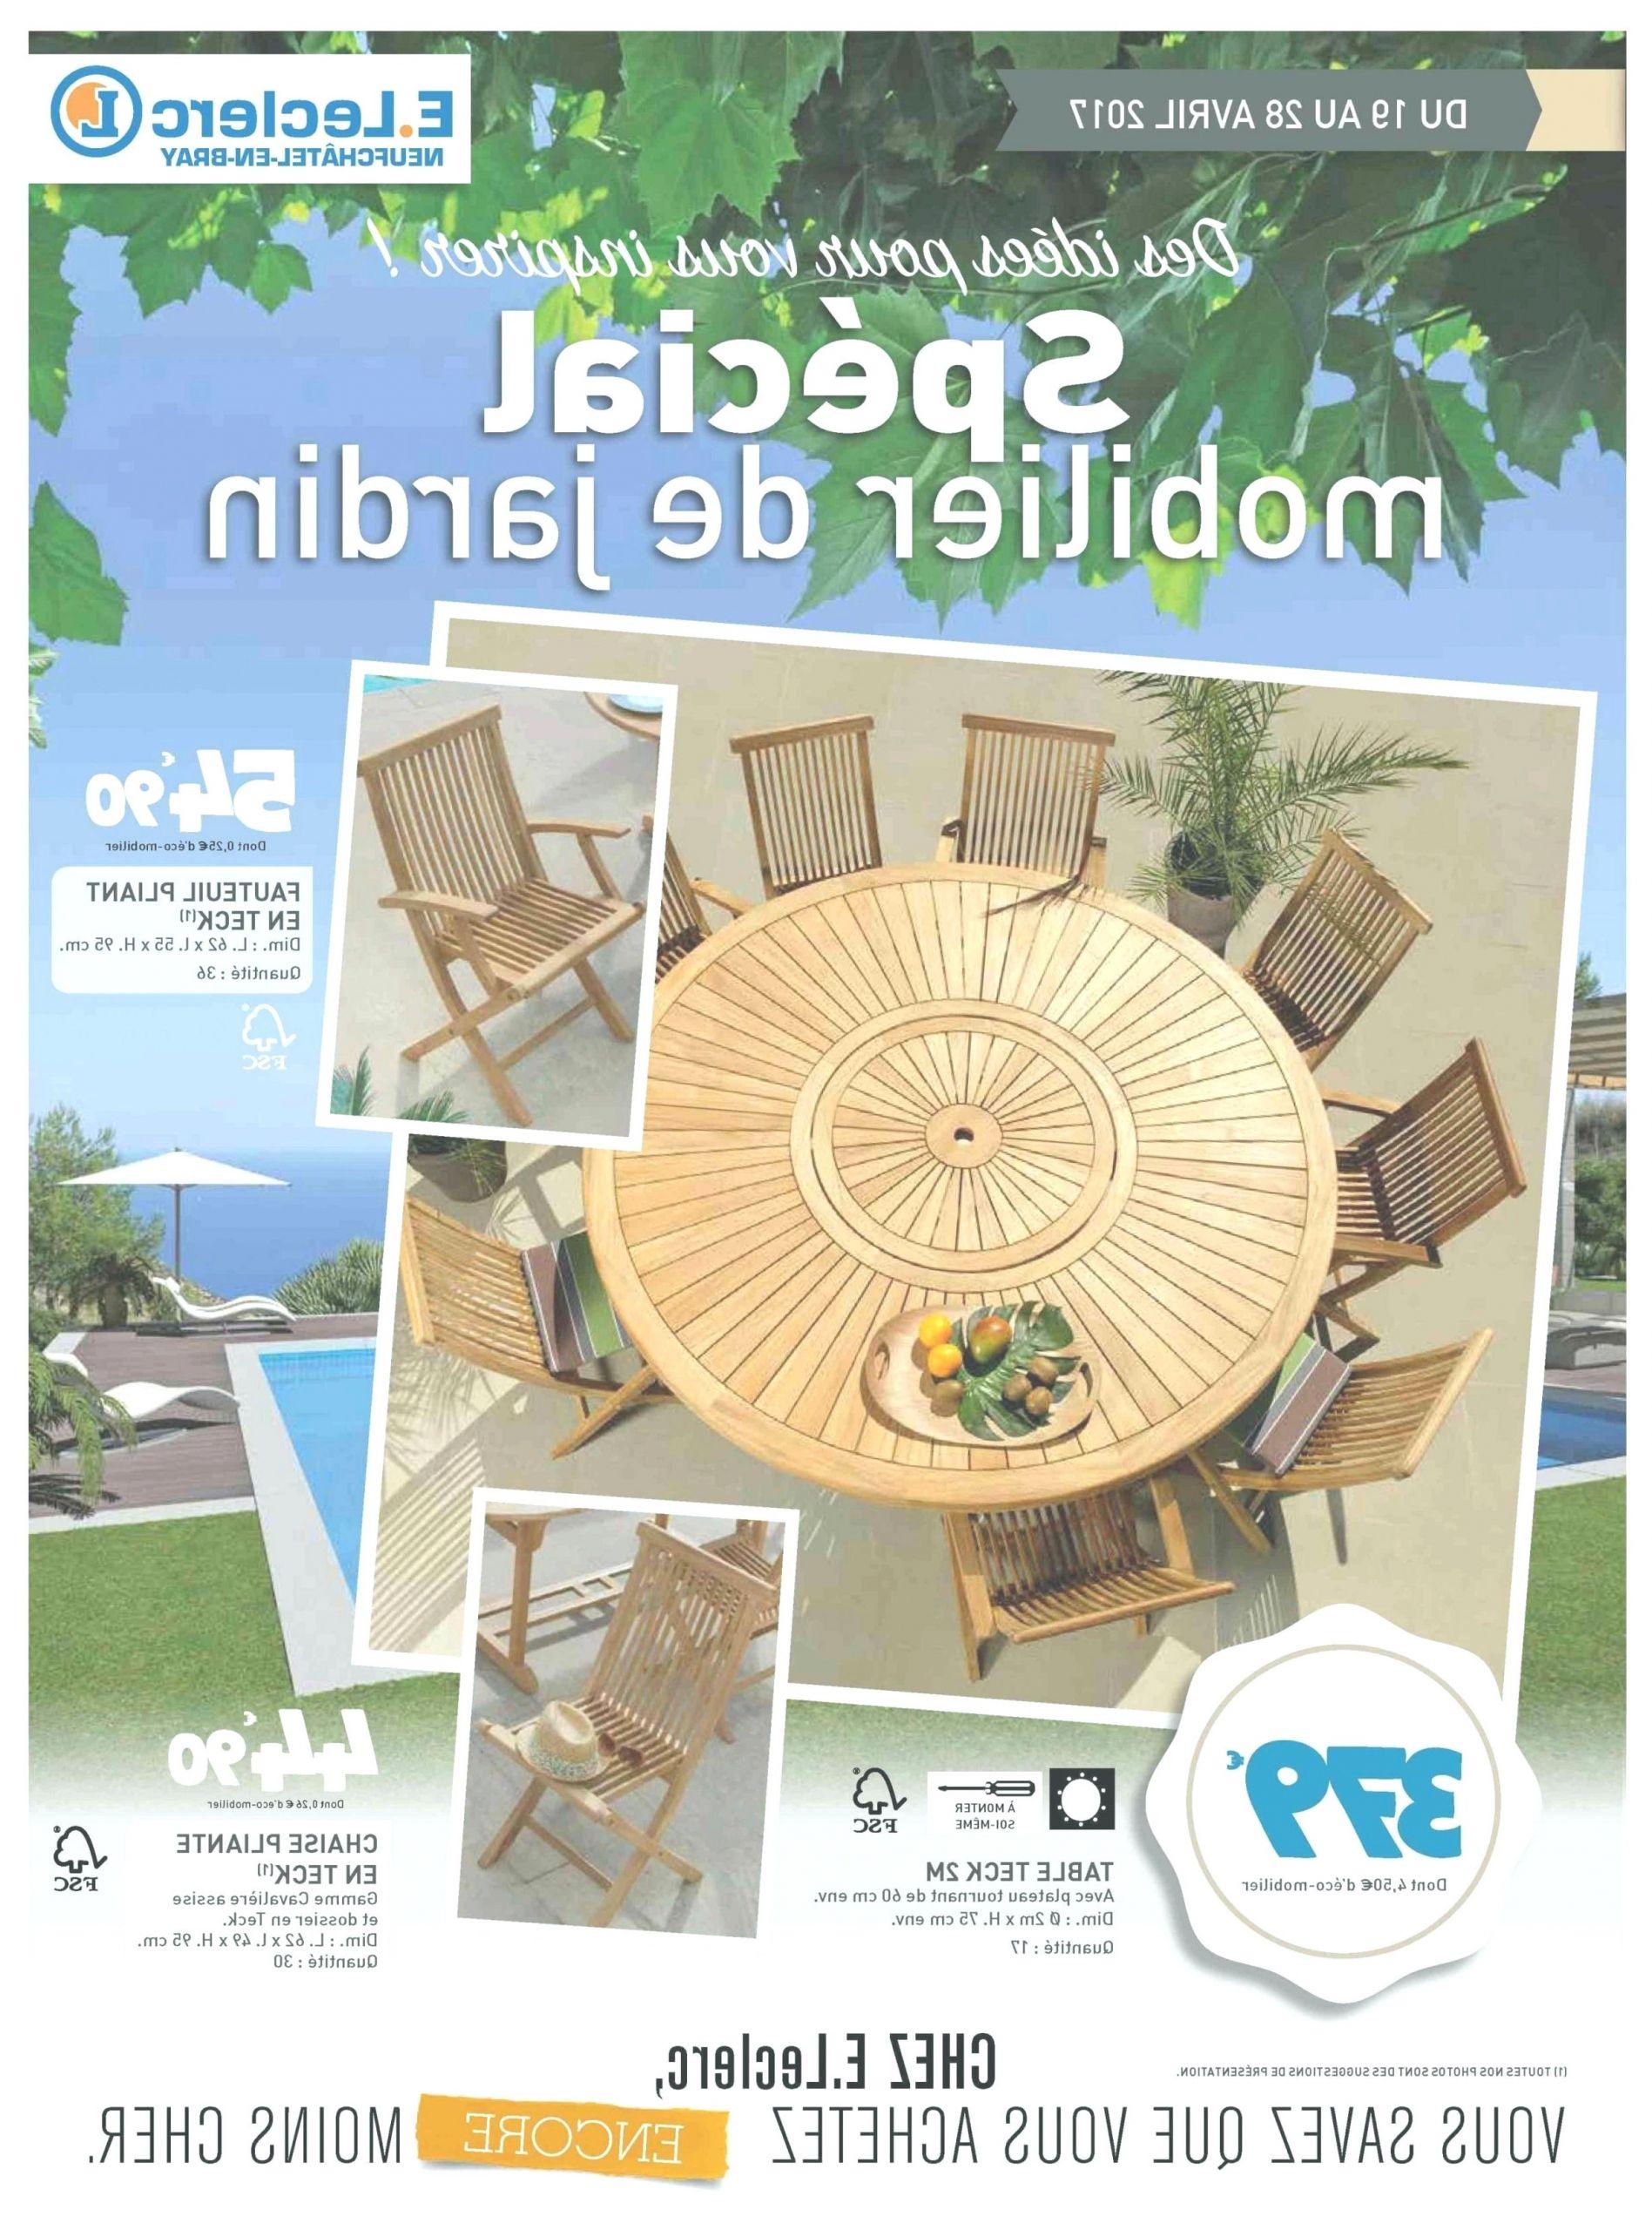 brico depot salon de jardin elegant 29 concept brico depot meuble of brico depot salon de jardin